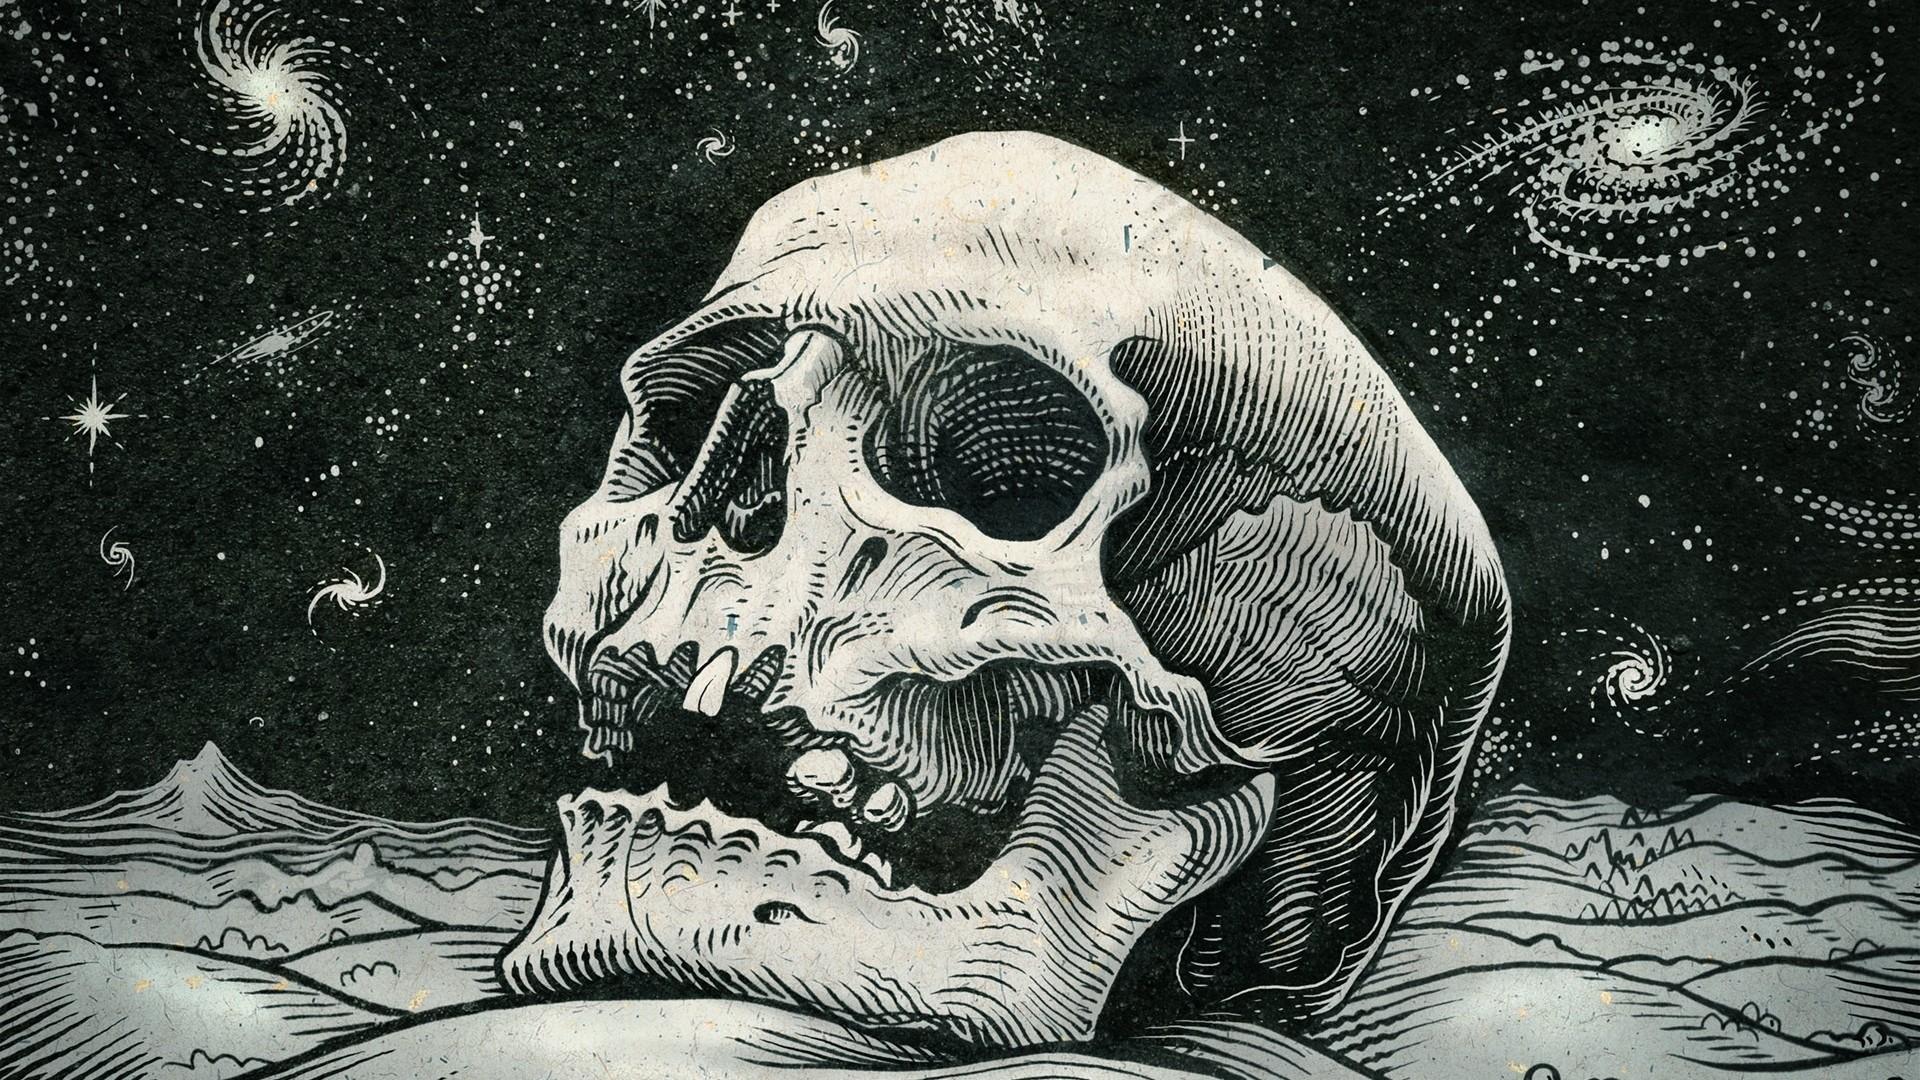 Hd sugar skull wallpaper 64 images - Skeleton wallpaper ...